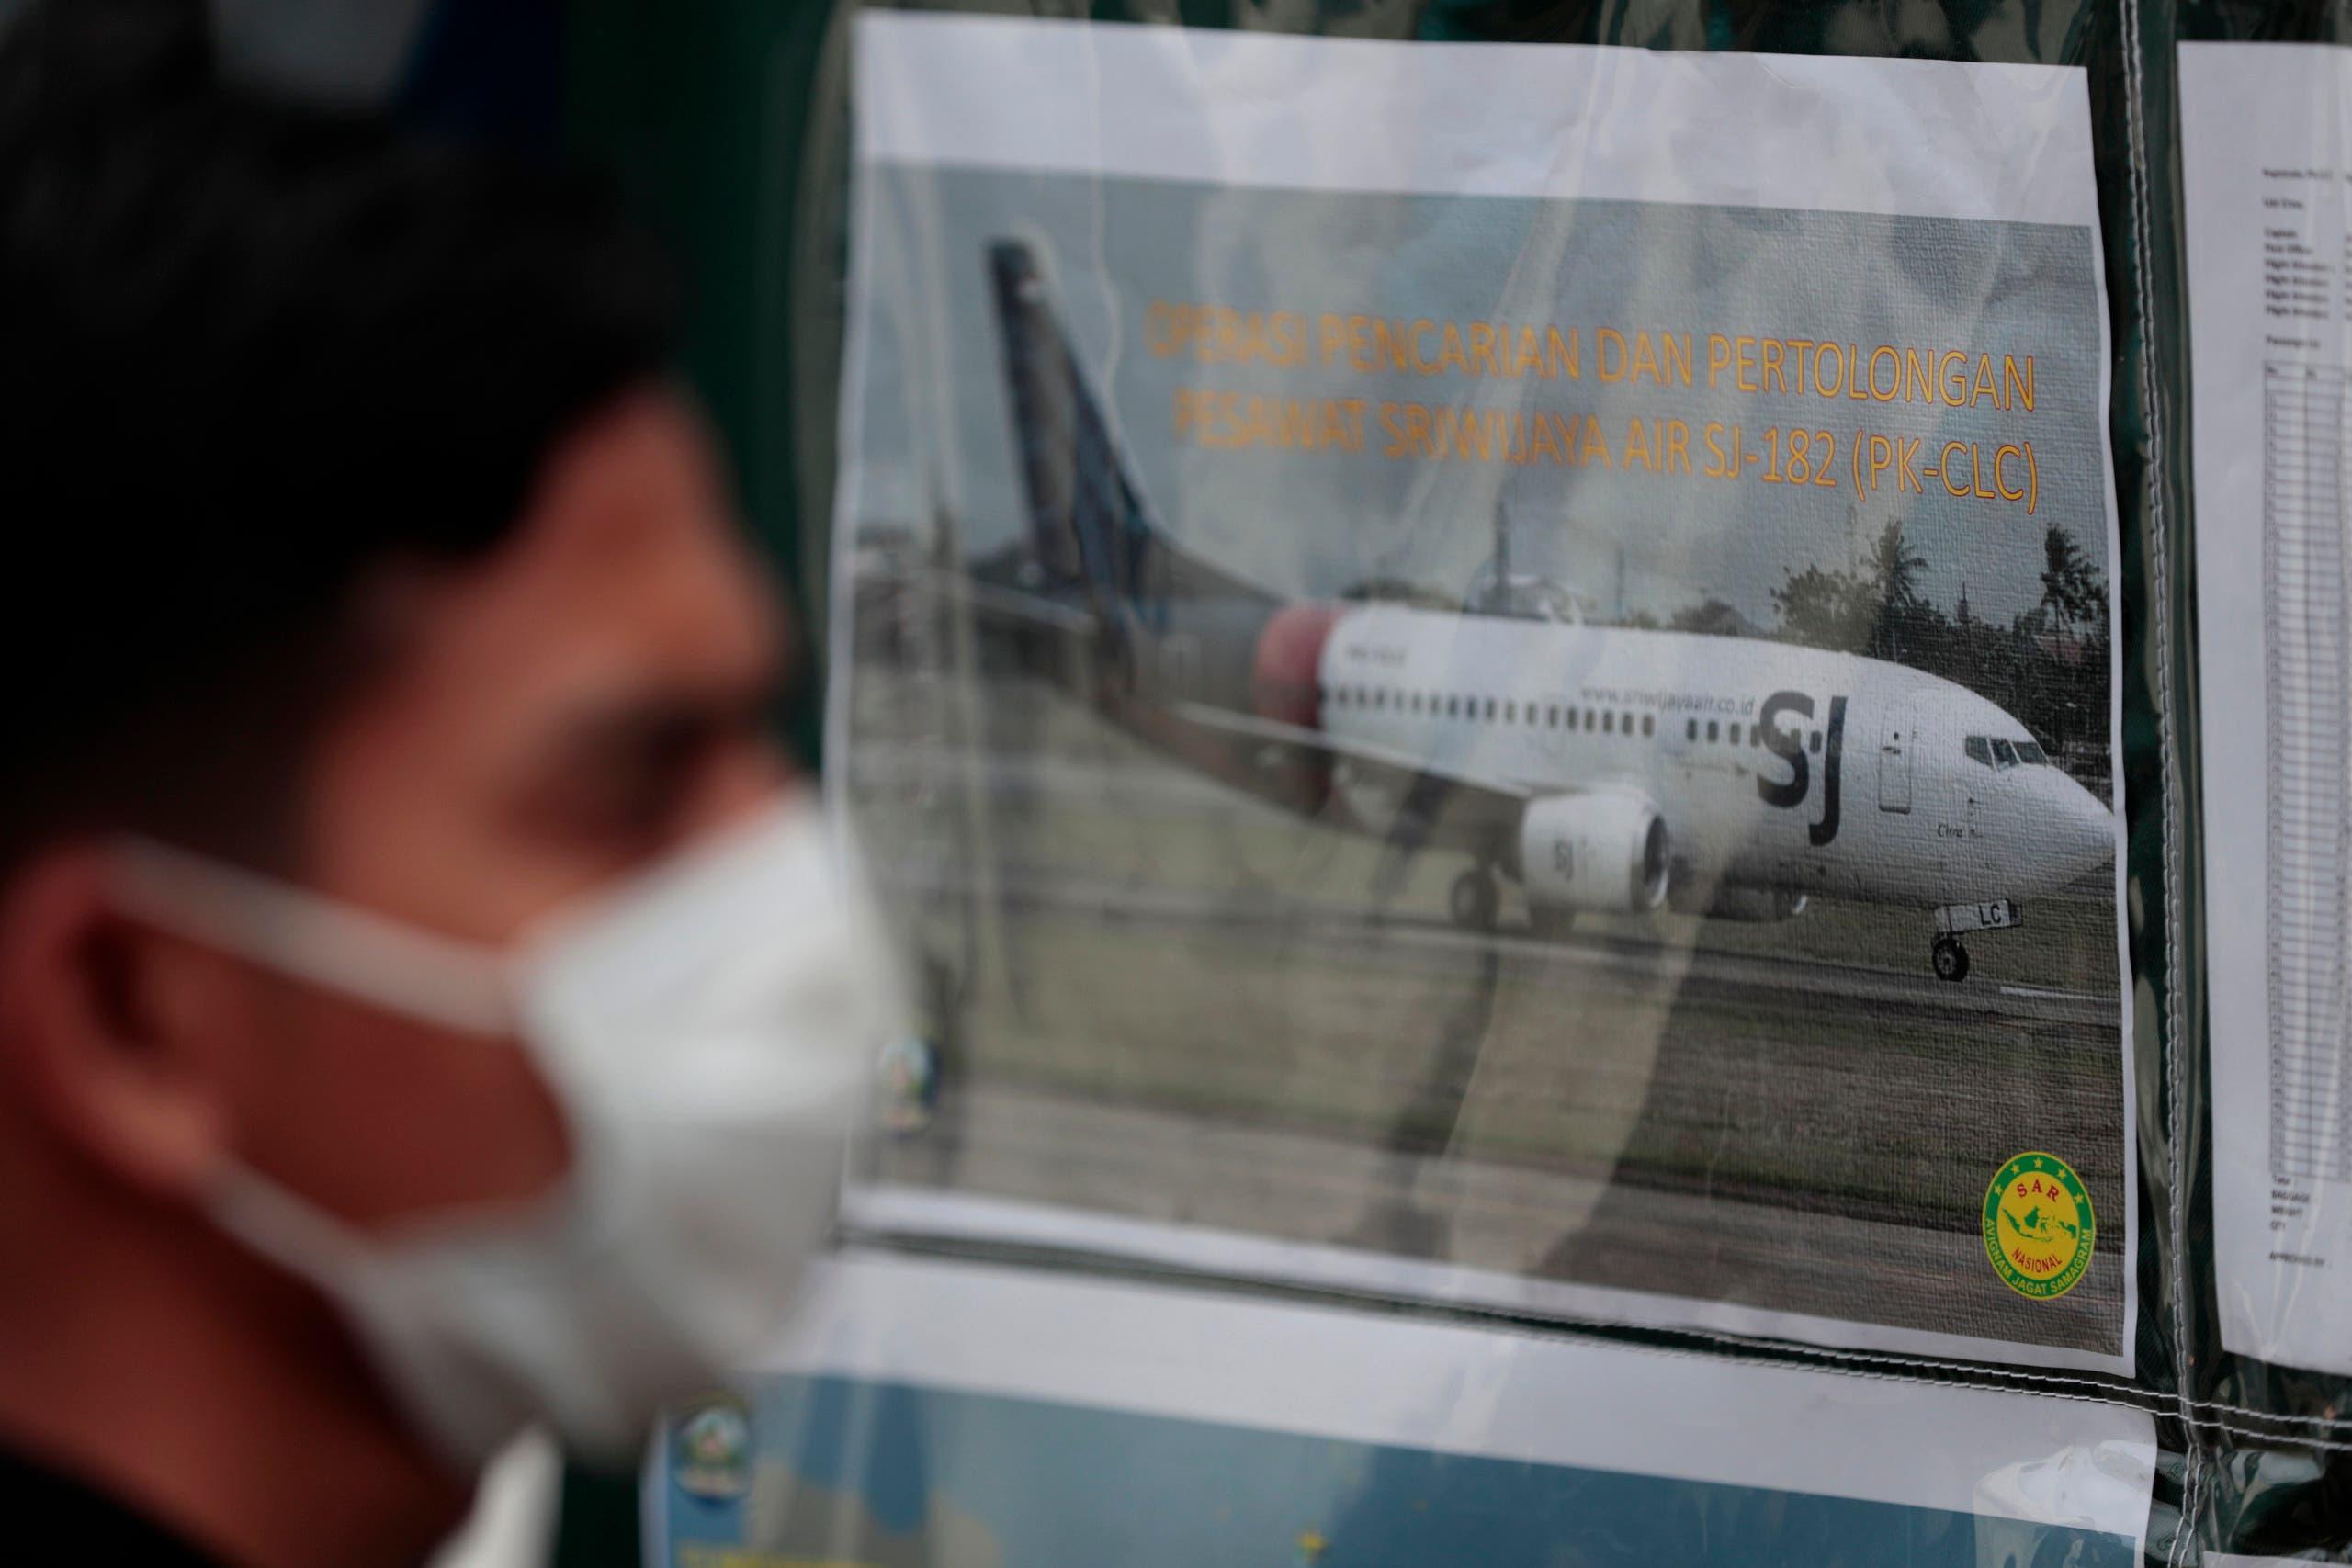 Indonesia plane crash (File photo)